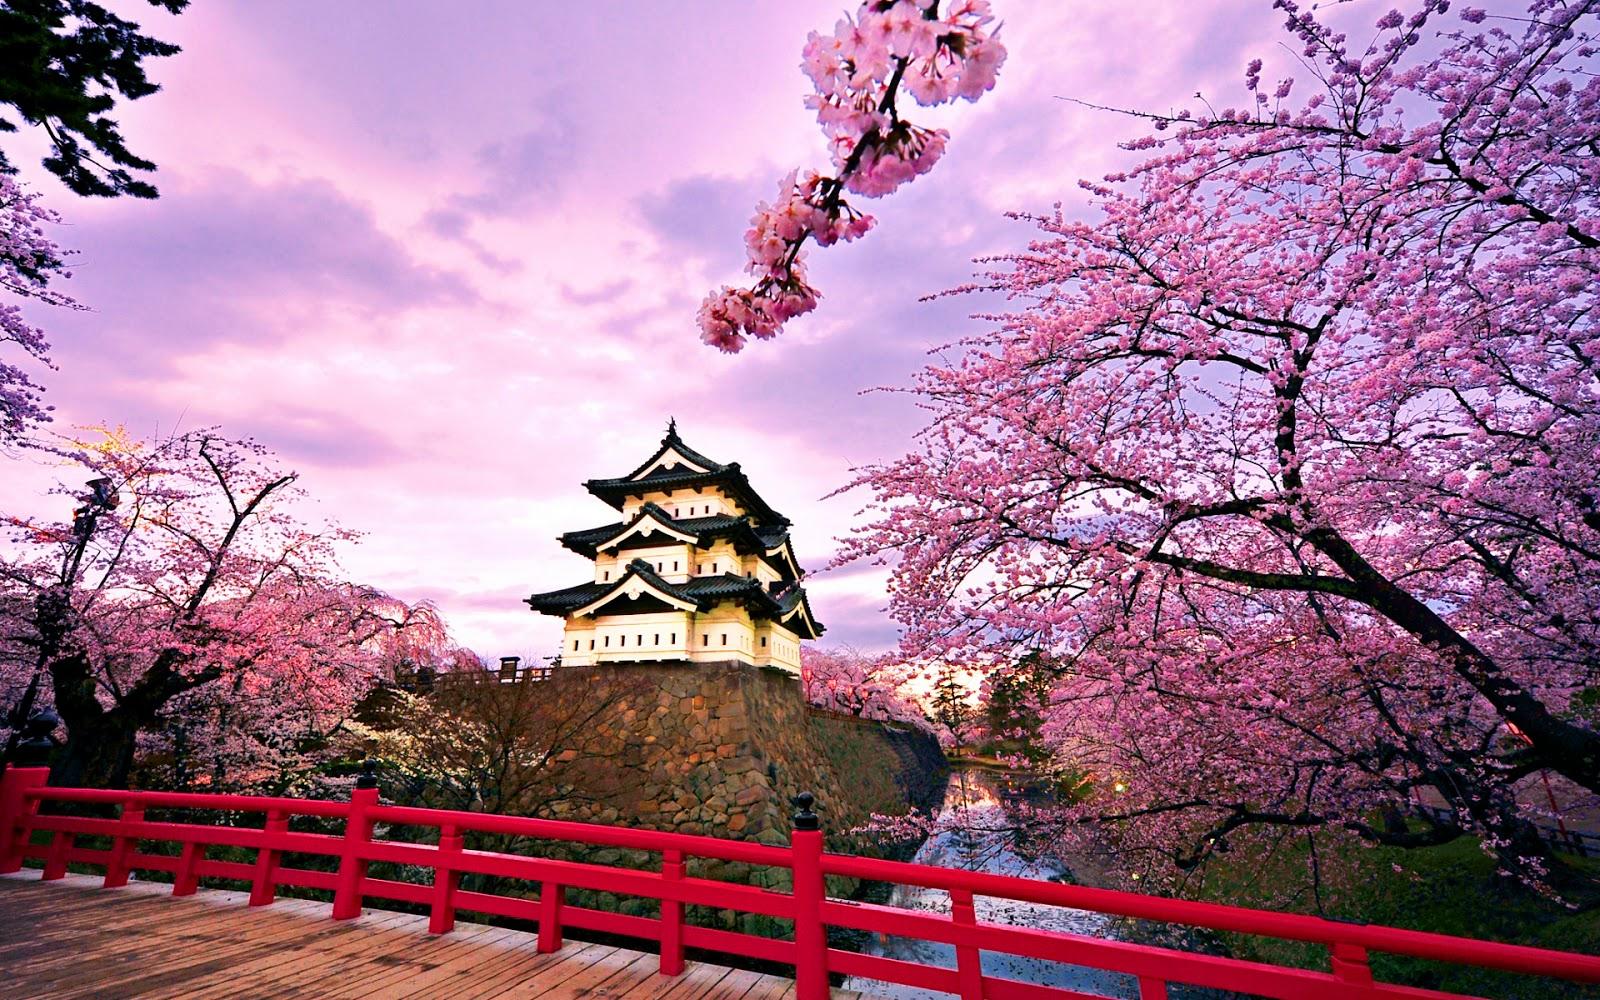 Ini 16 Taman Taman Terbaik Di Negeri Sakura Jepang Semoga